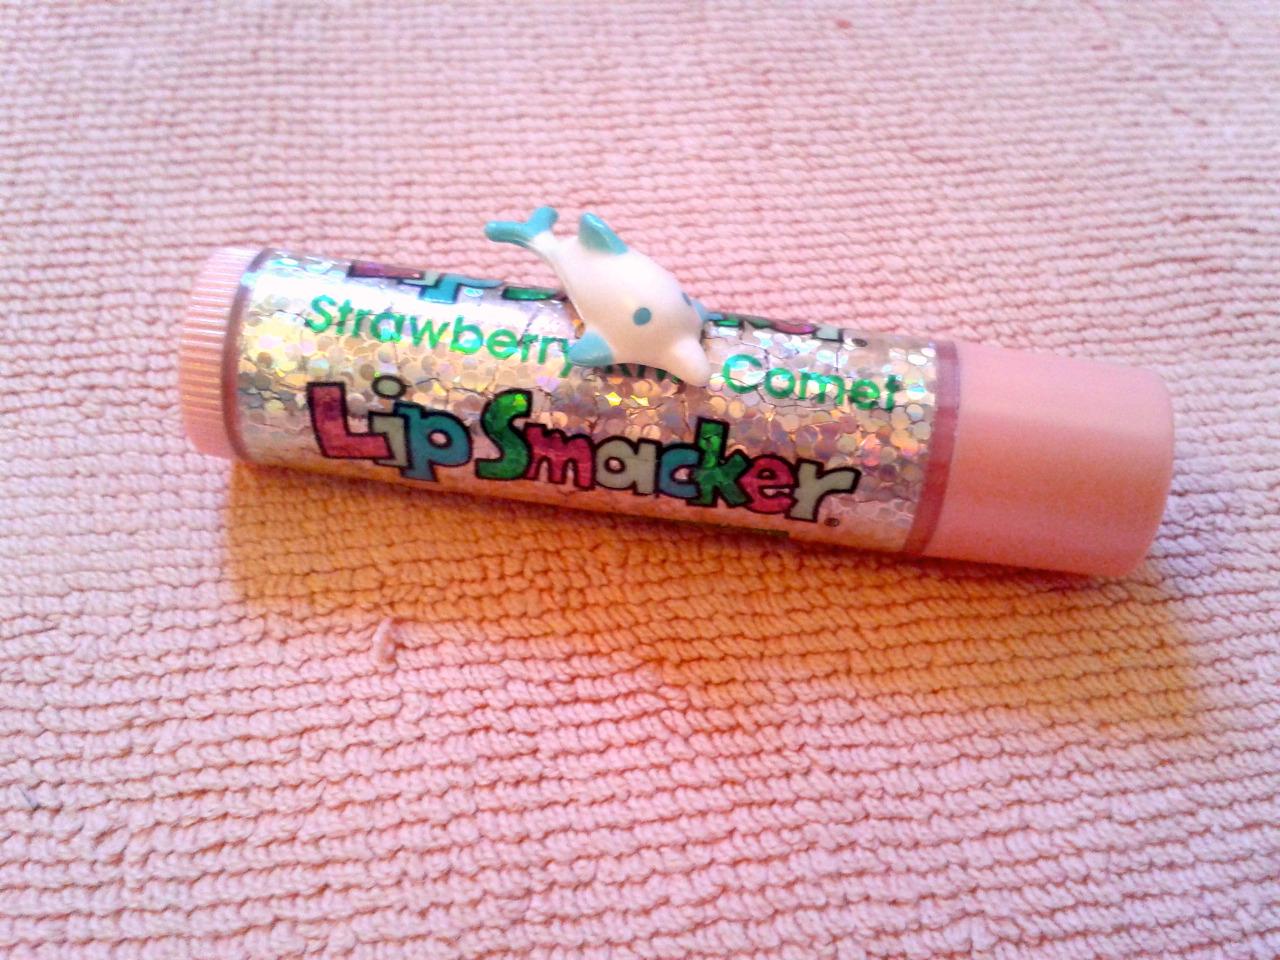 strawberry kiwi comet lip smacker